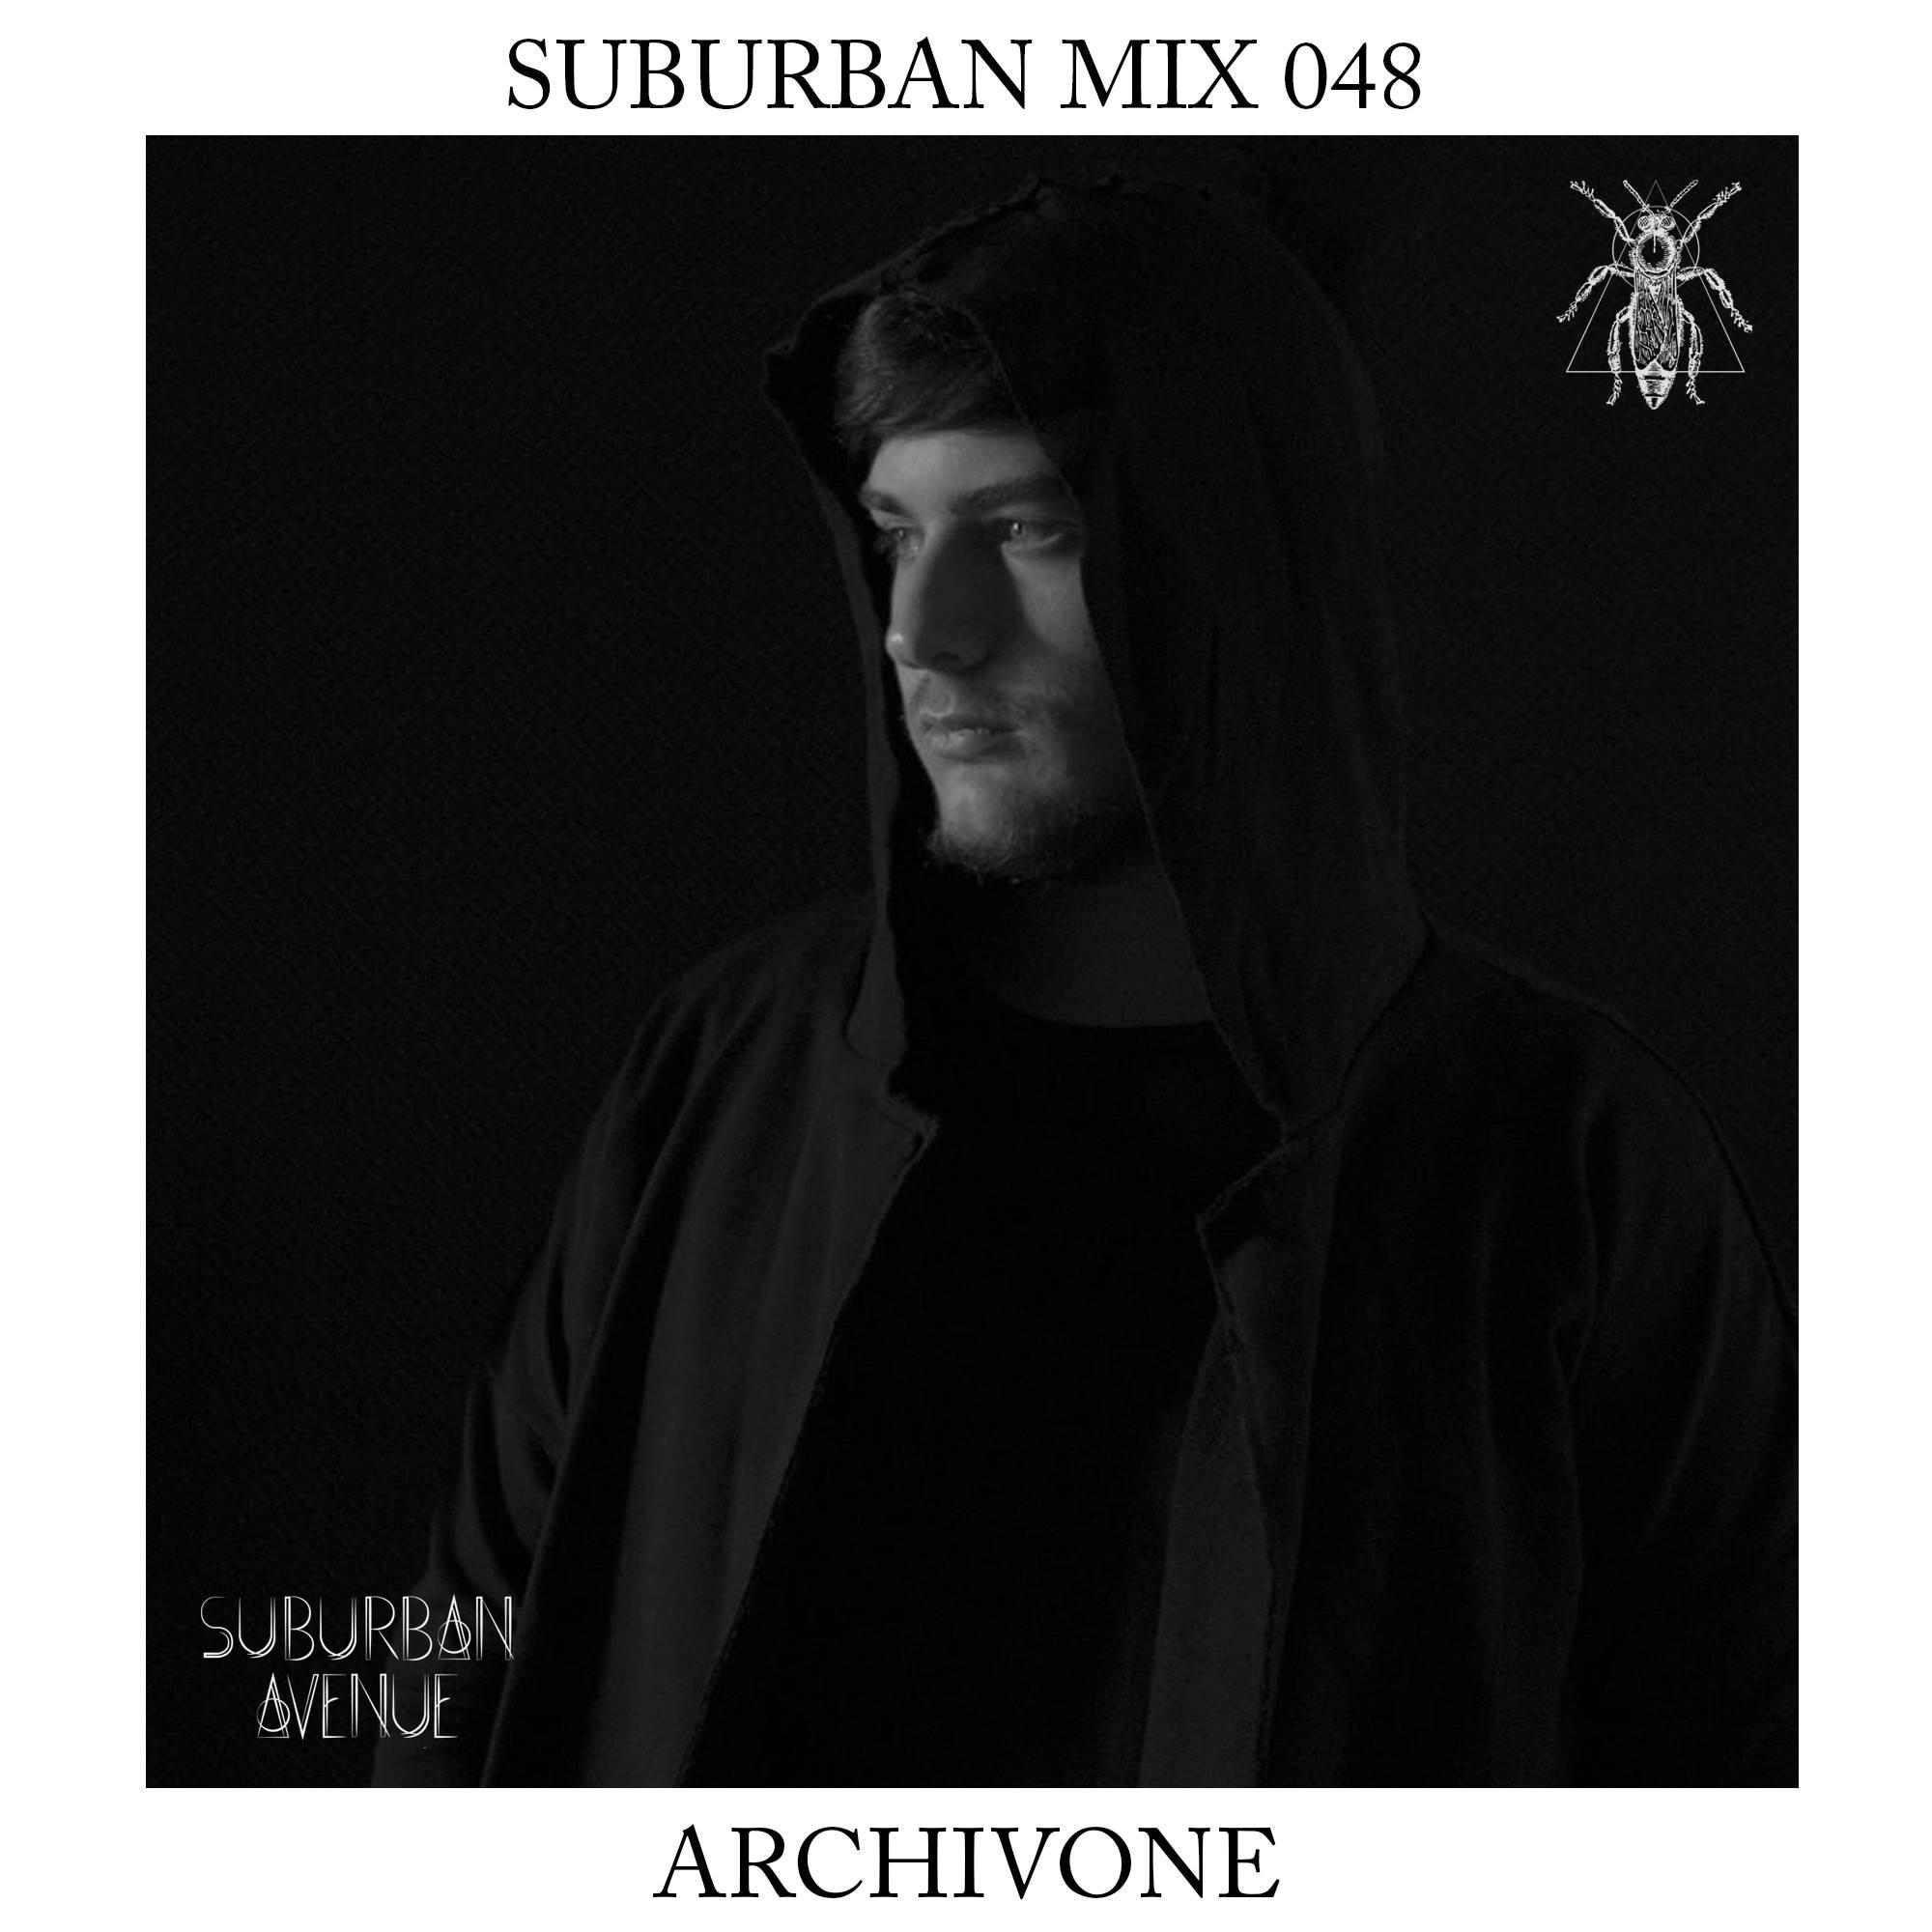 Suburban Mix 048 - Archivone